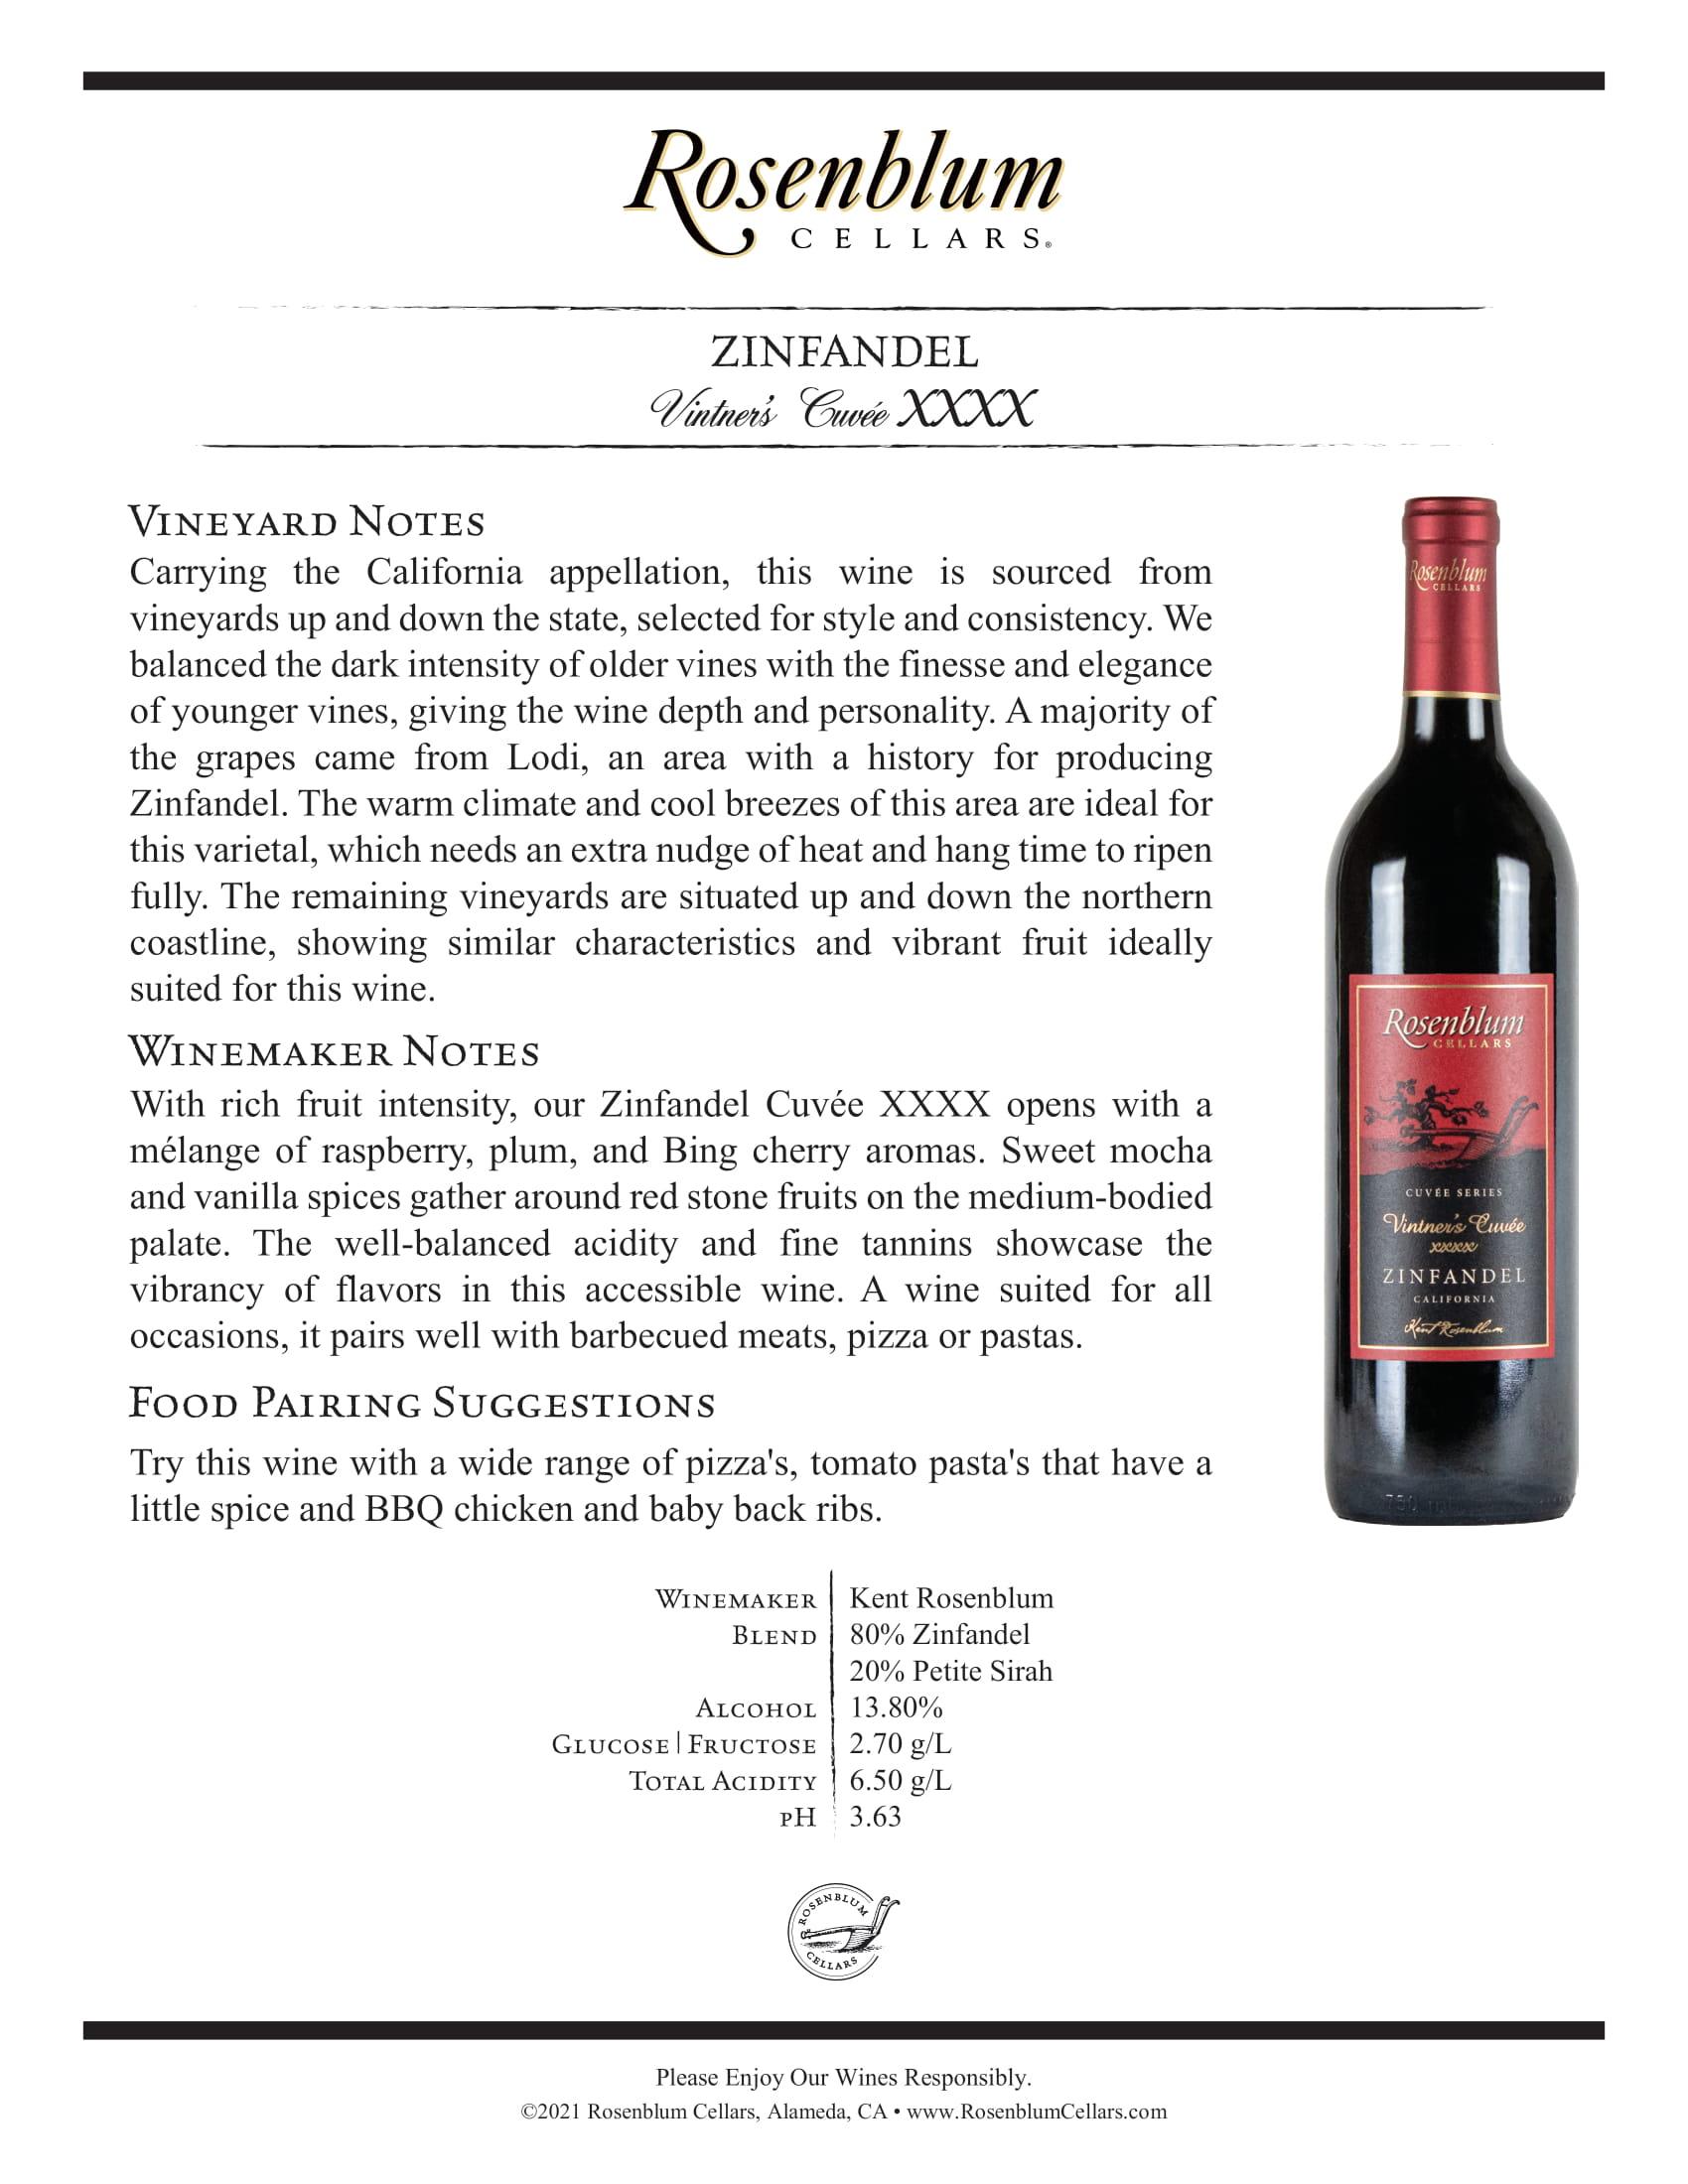 Rosenblum Cellars Vintner's Cuvée XXXX Zinfandel Tech Sheet